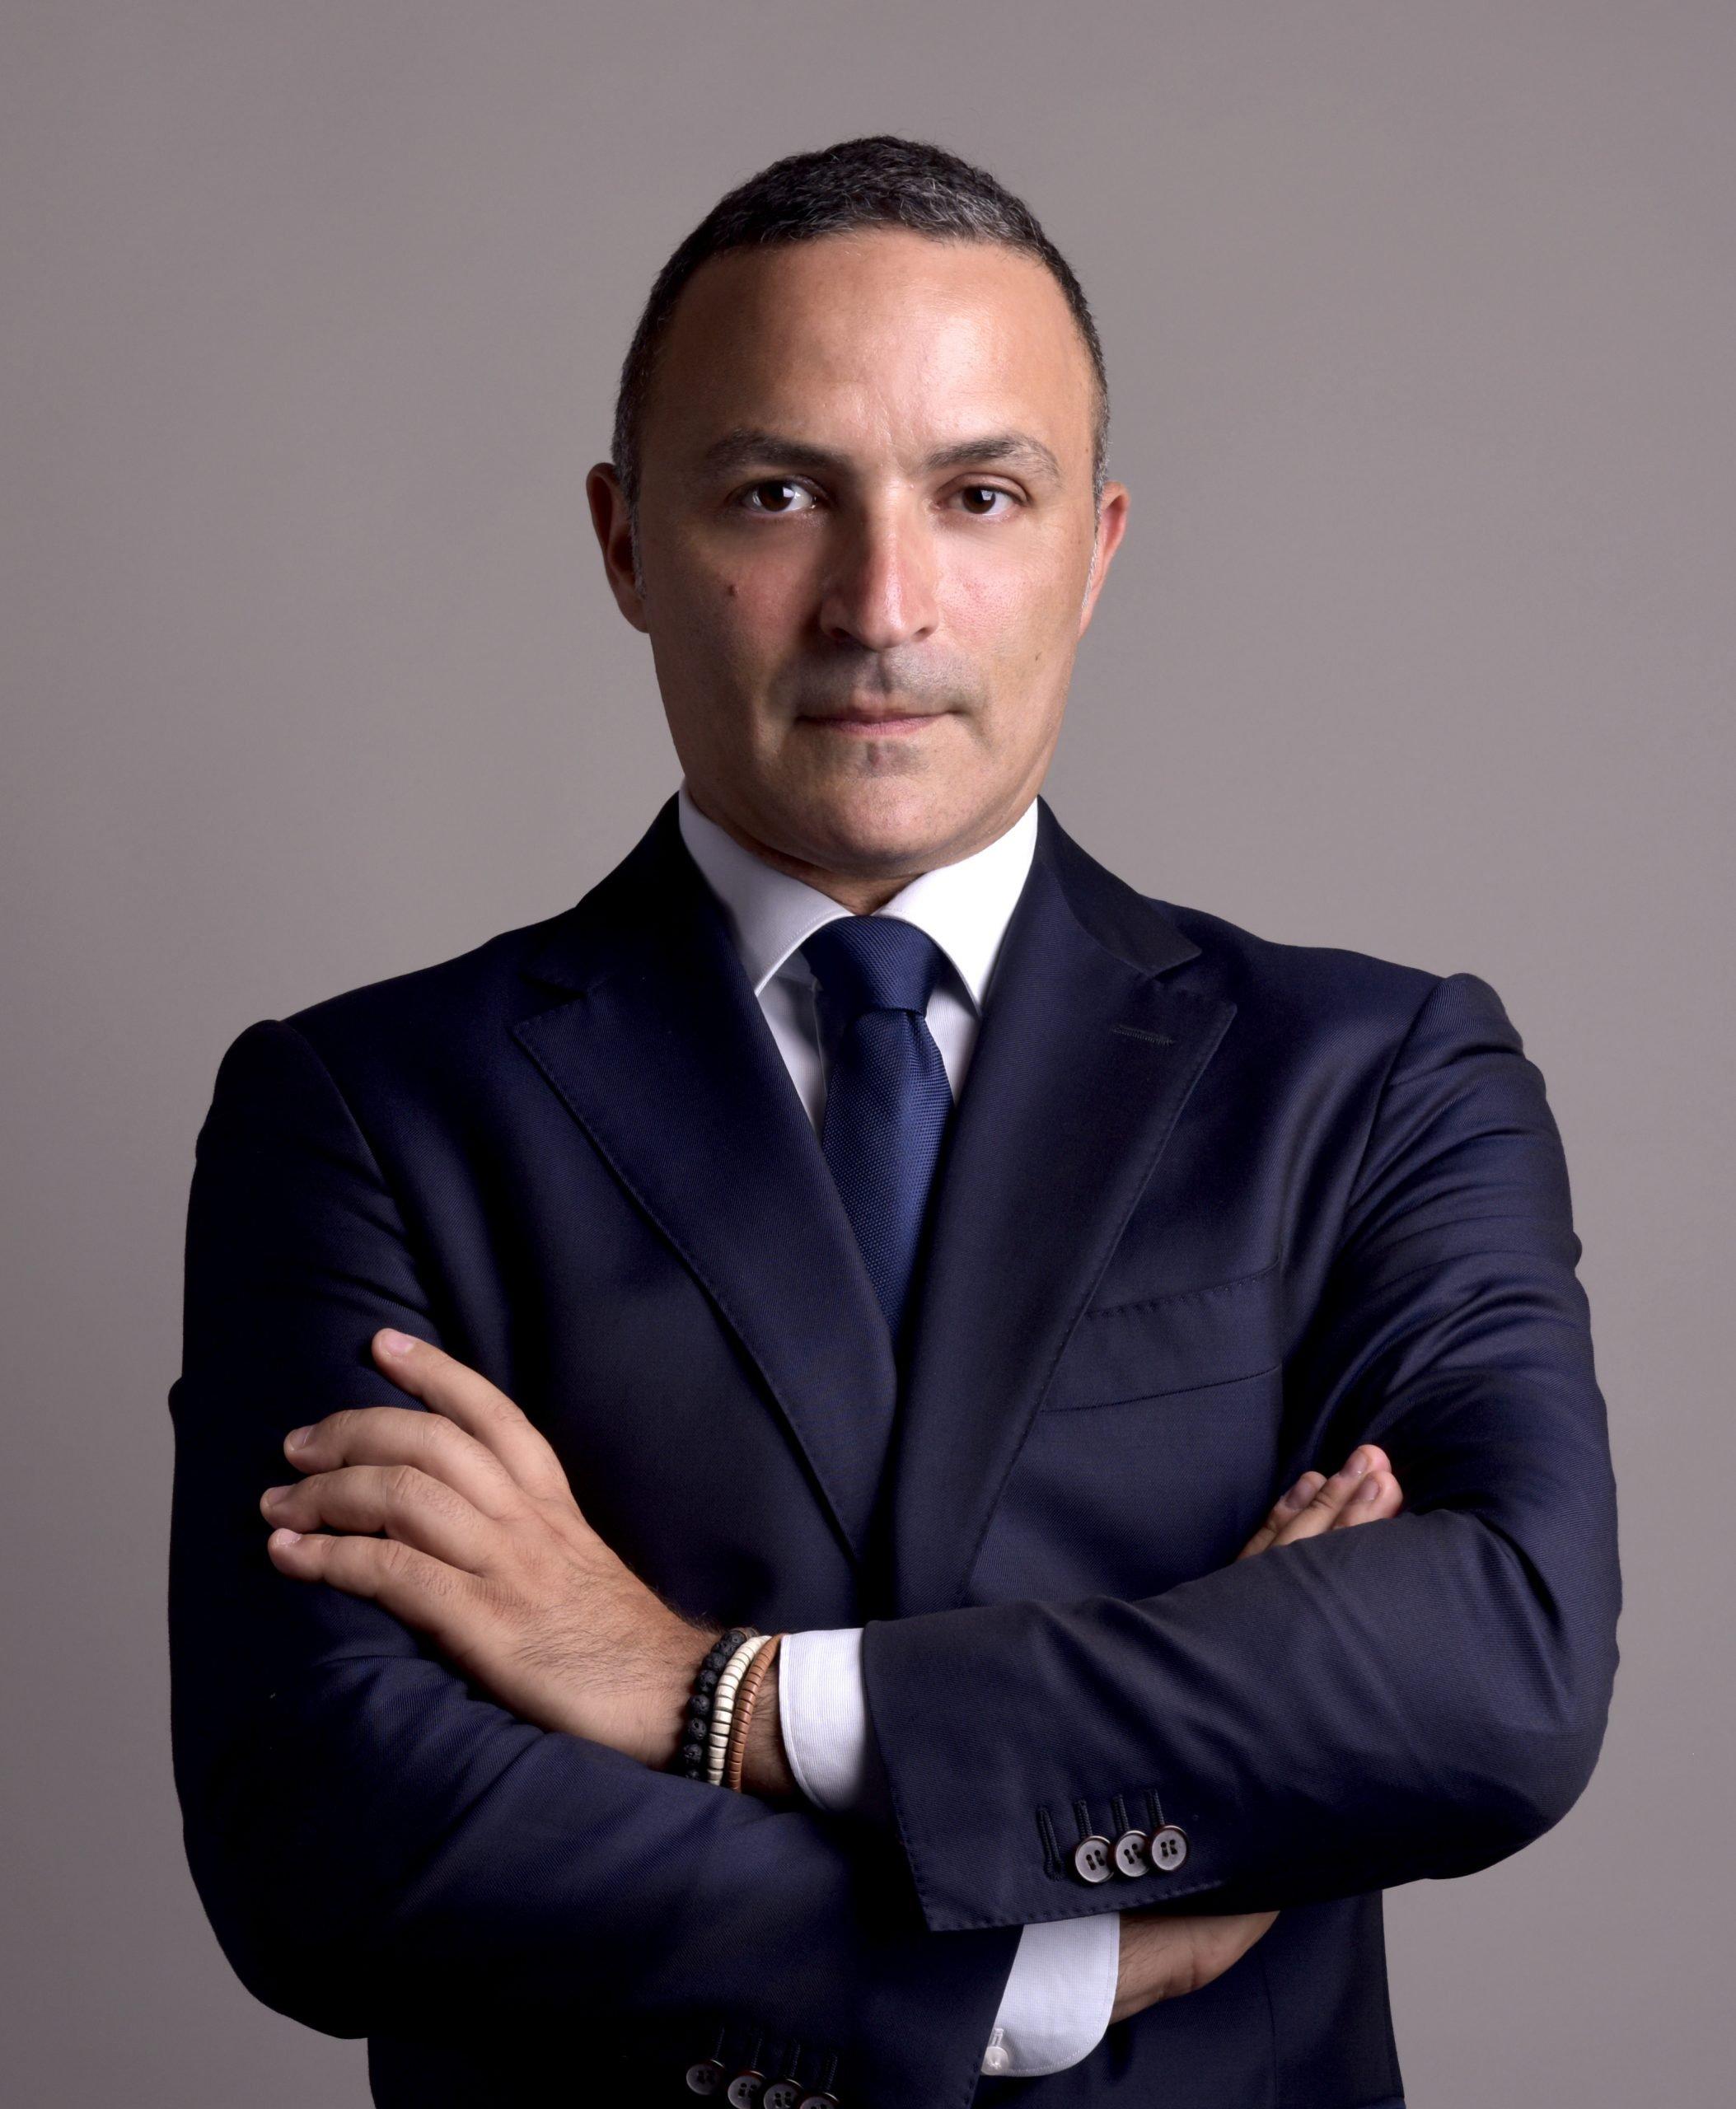 Pietro Latella